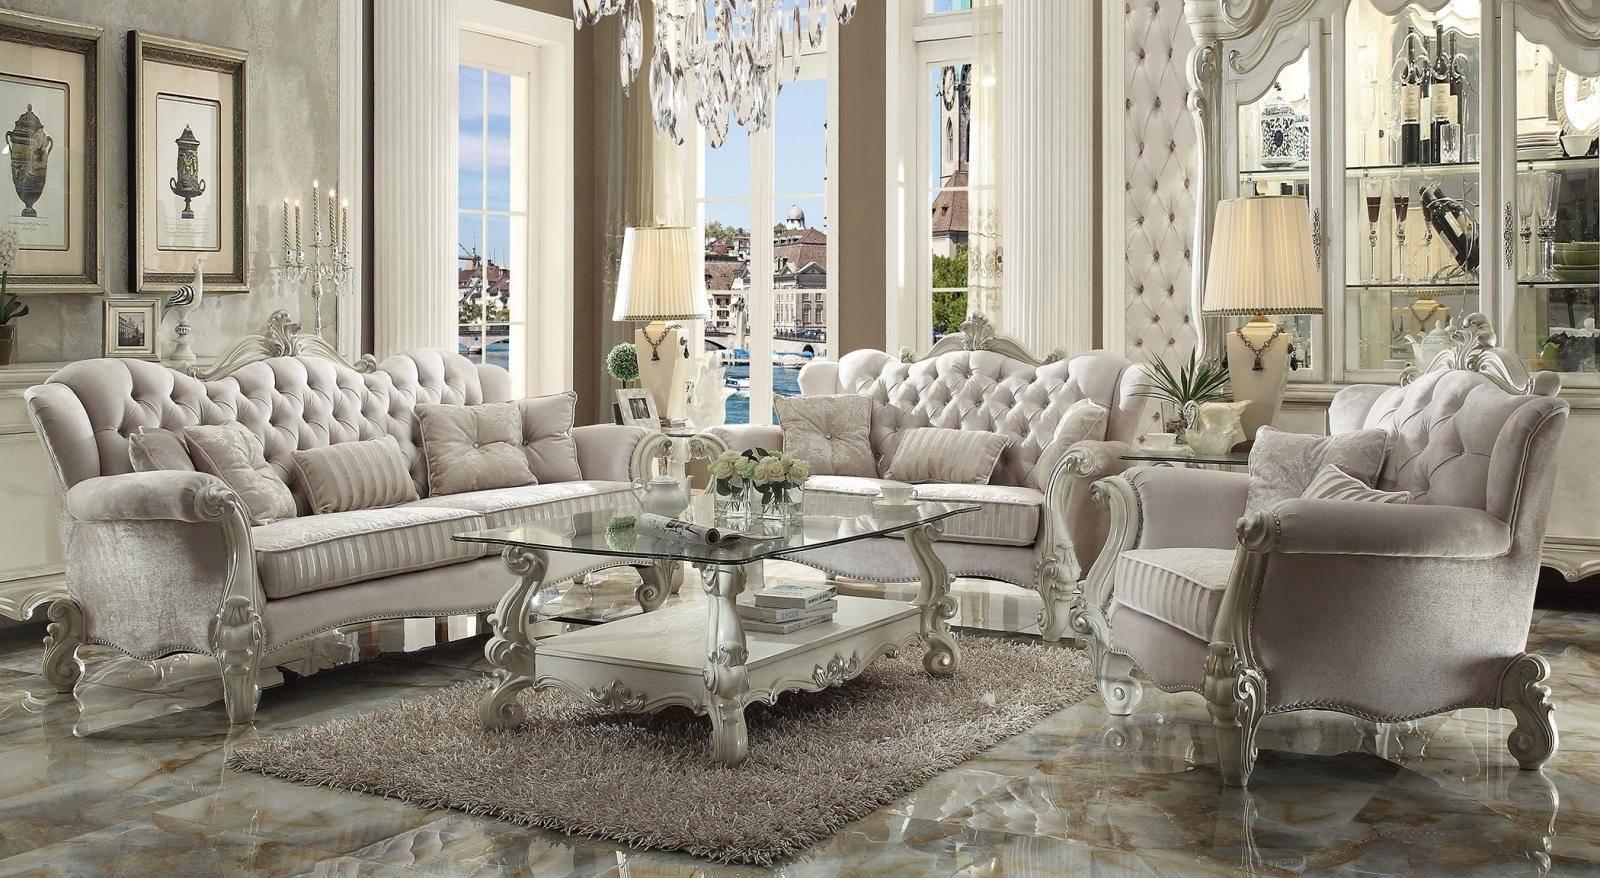 Astoria Grand Welton Sofa Loveseat, Welton Furniture Dining Room